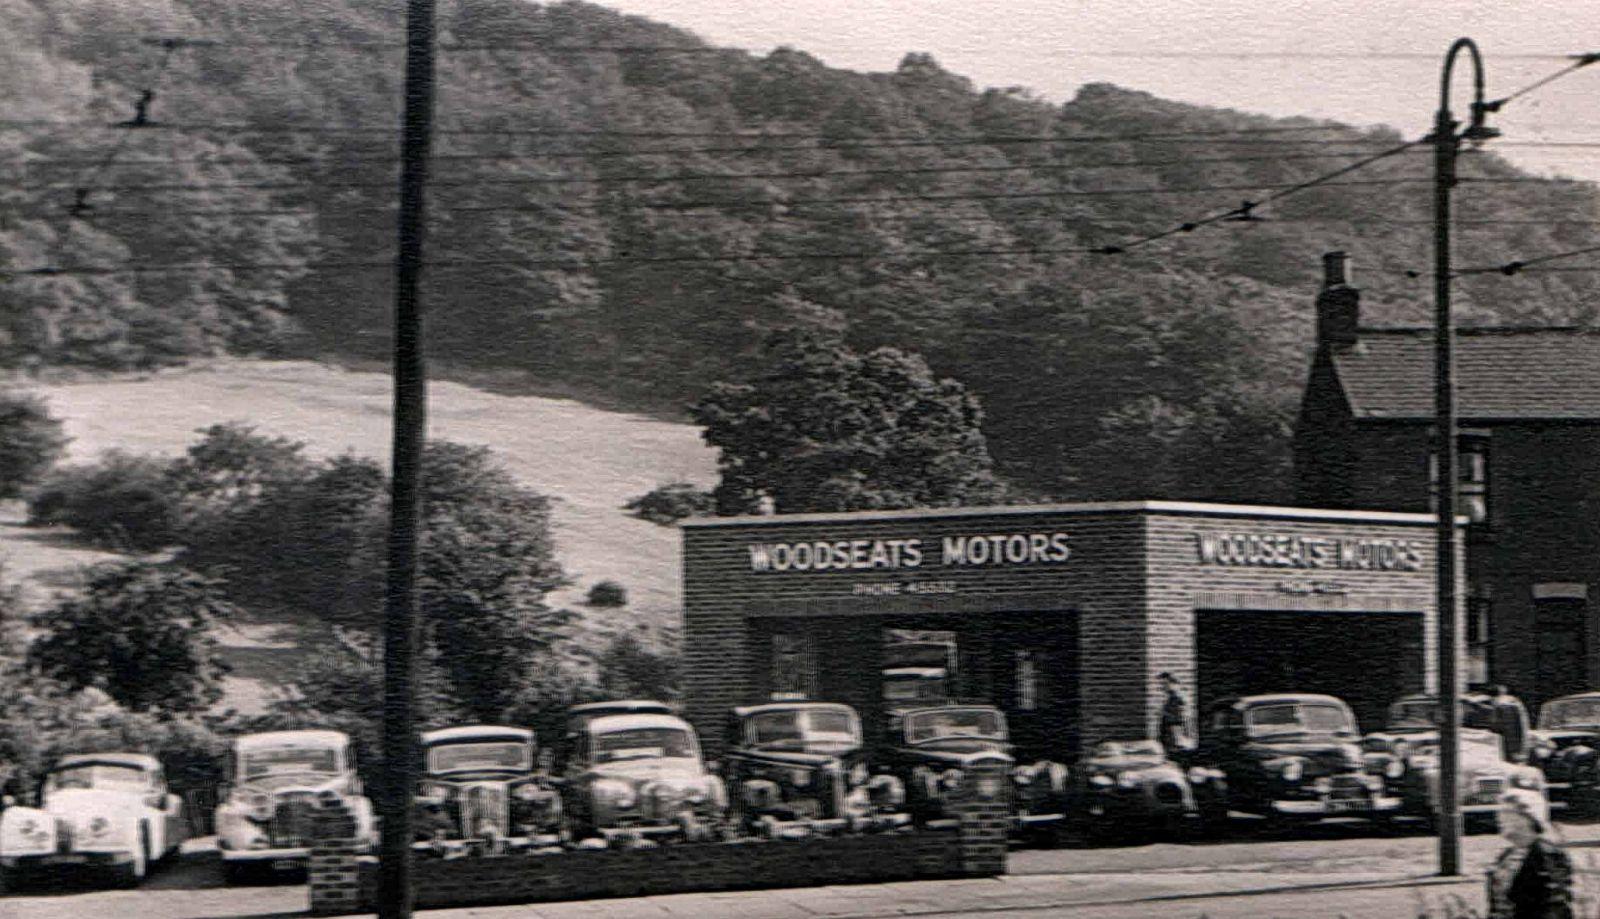 Woodseats Motors 02